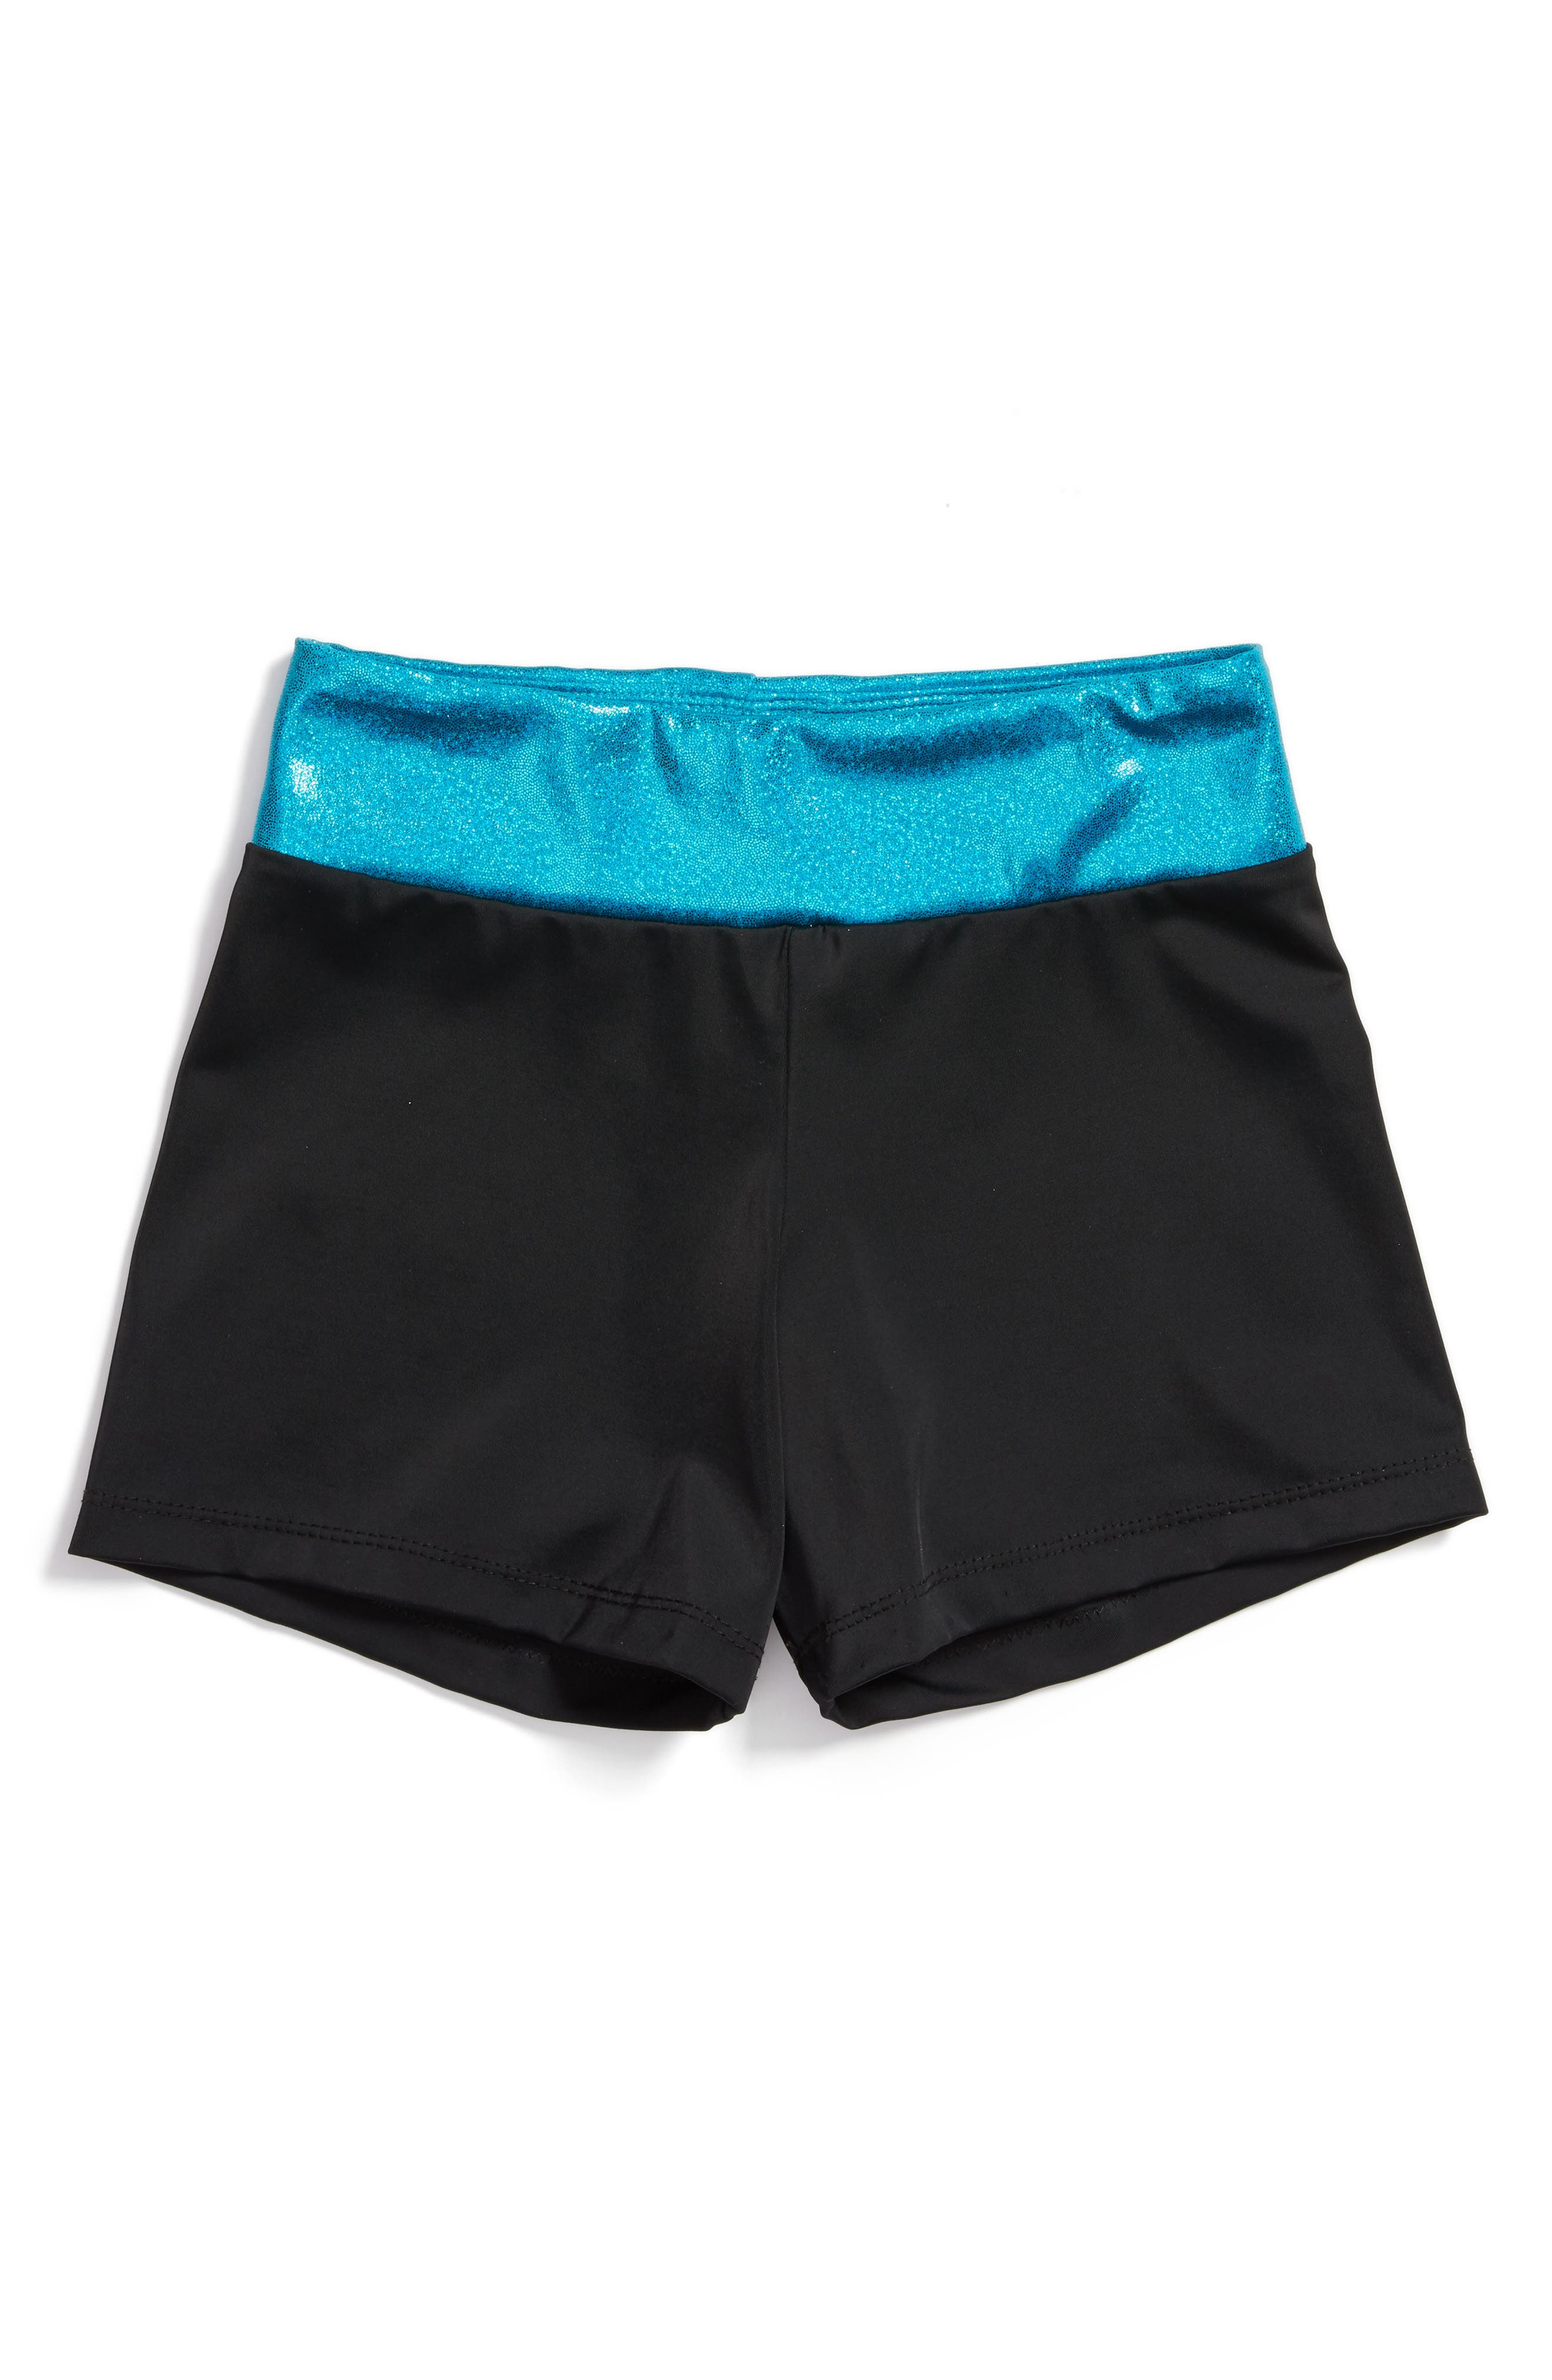 Unicorn Love Stretch Shorts,                         Main,                         color, Black/ Turquoise